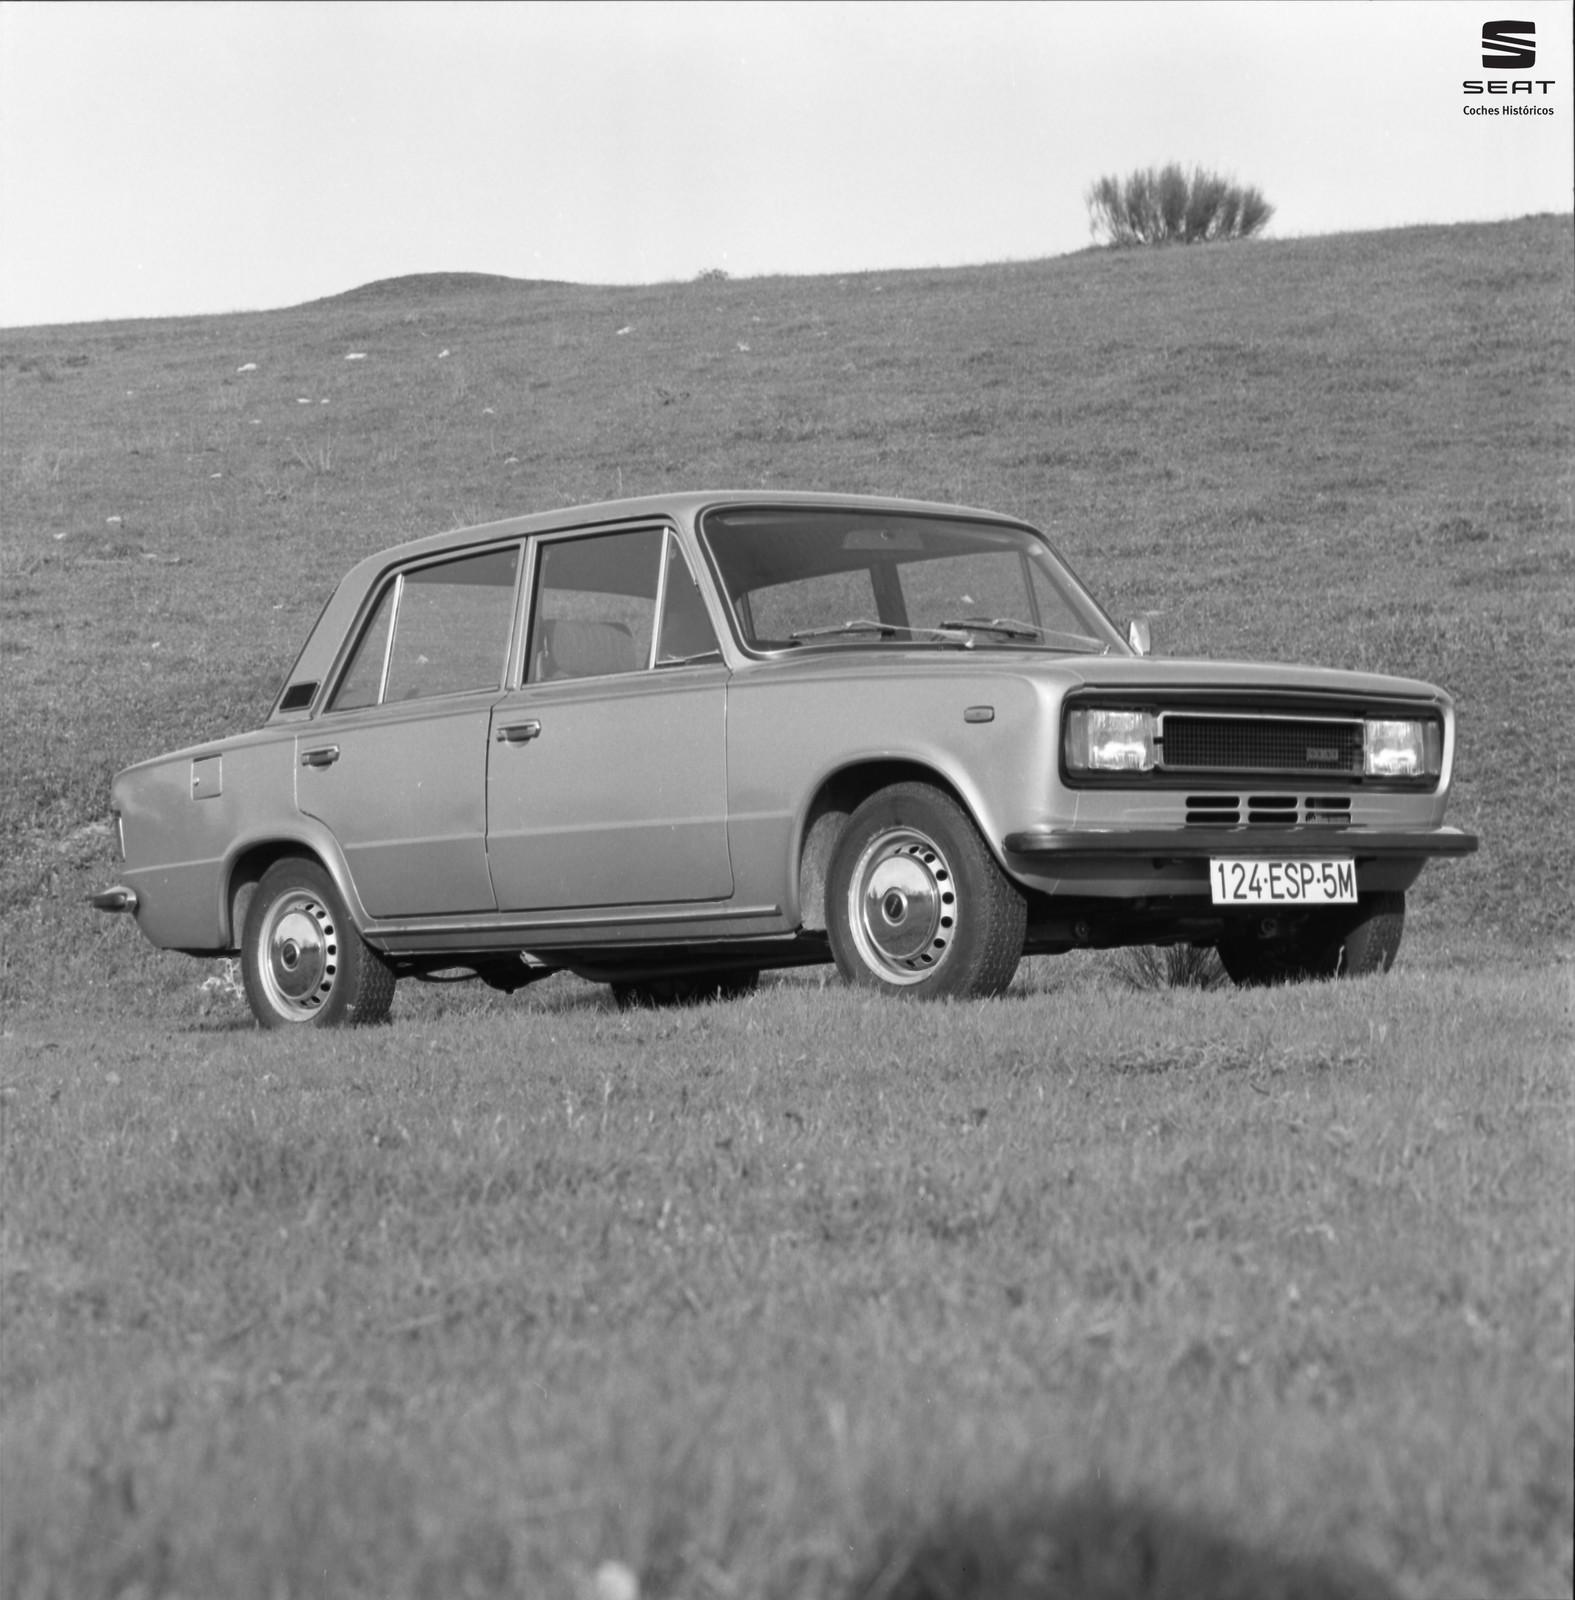 Foto de Motor SEAT 1430 - fotos históricas (11/49)